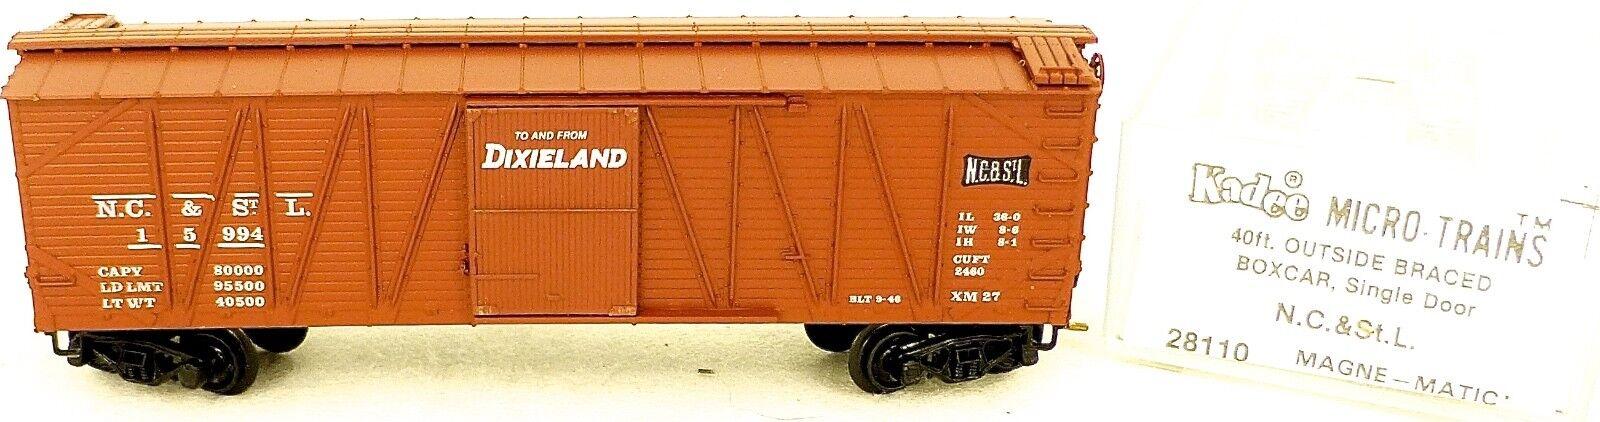 40 ´ Outside Braced Boxcar N.C.&st.l. 1 15994 Micro Trains Line 28110 N 1 N.C.&st.l. 160 C Å 1a7d7d